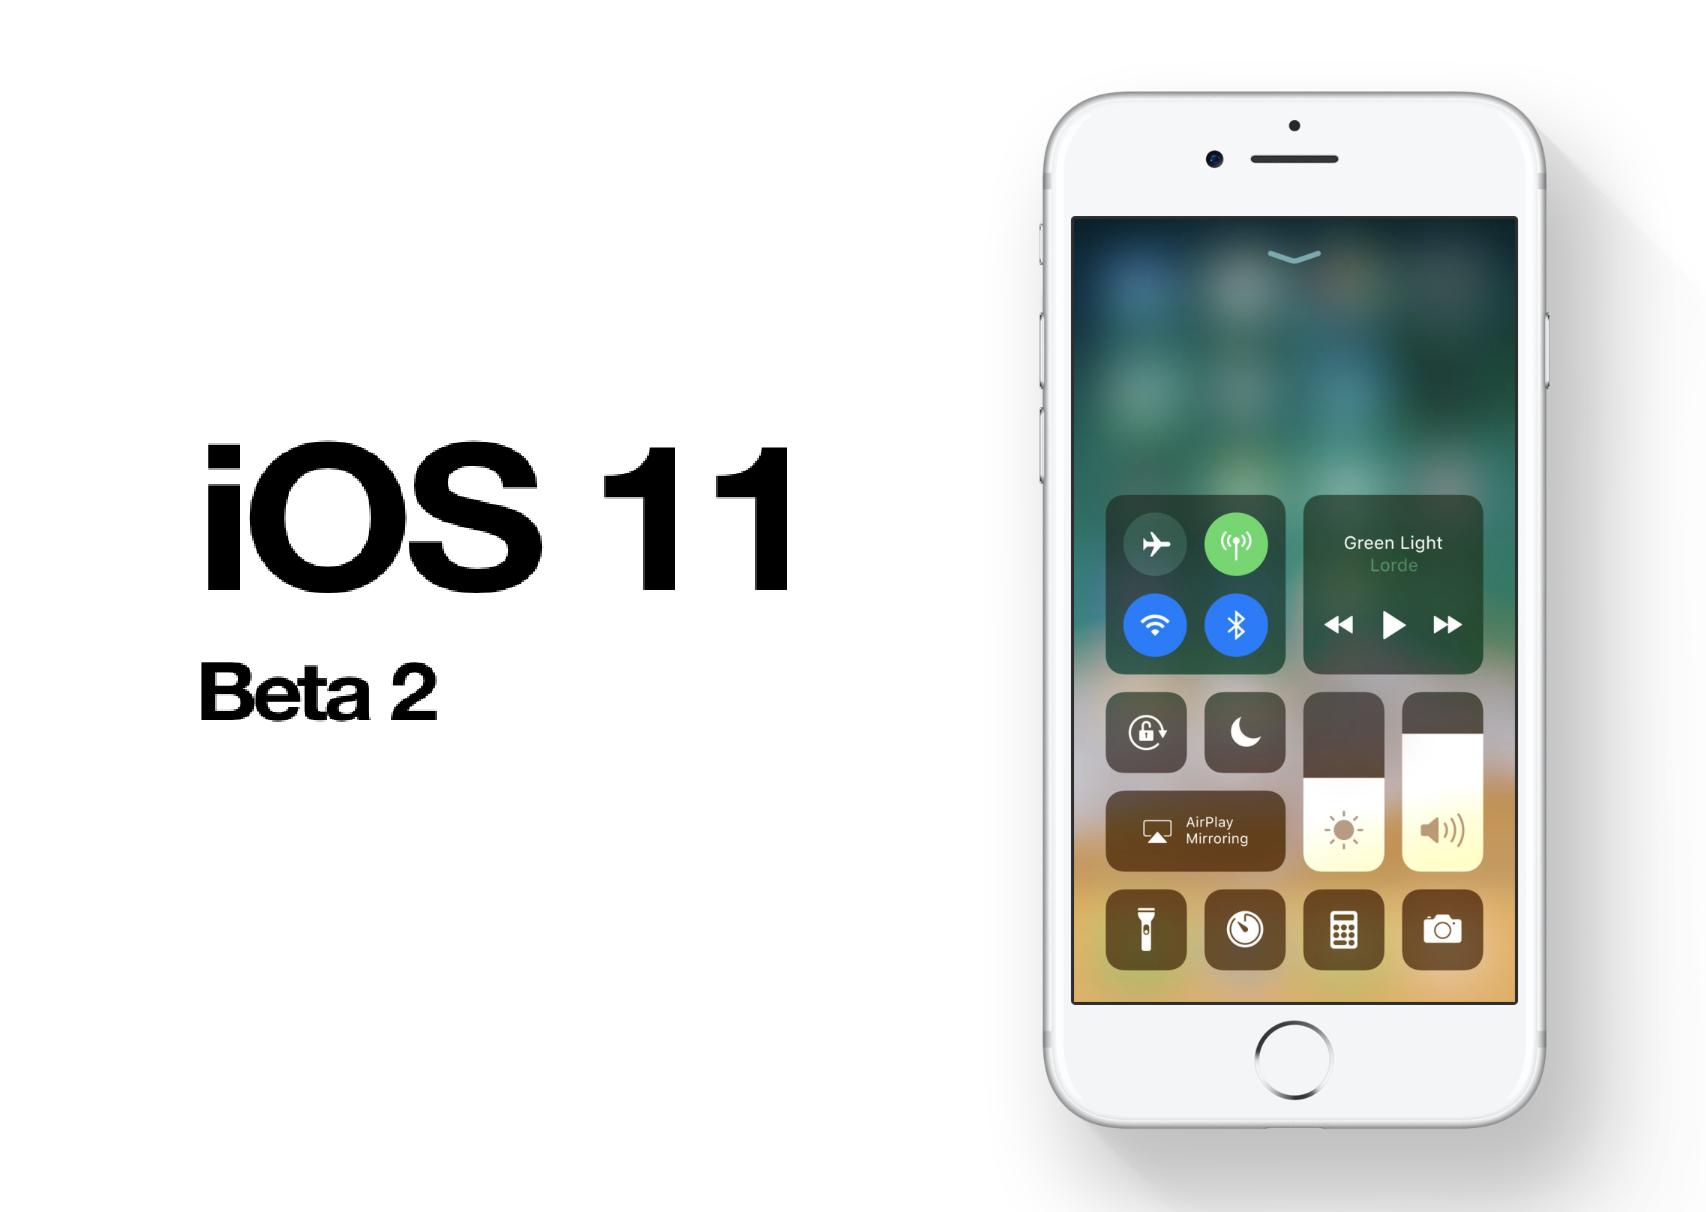 Apple launches iOS 11 Beta 2